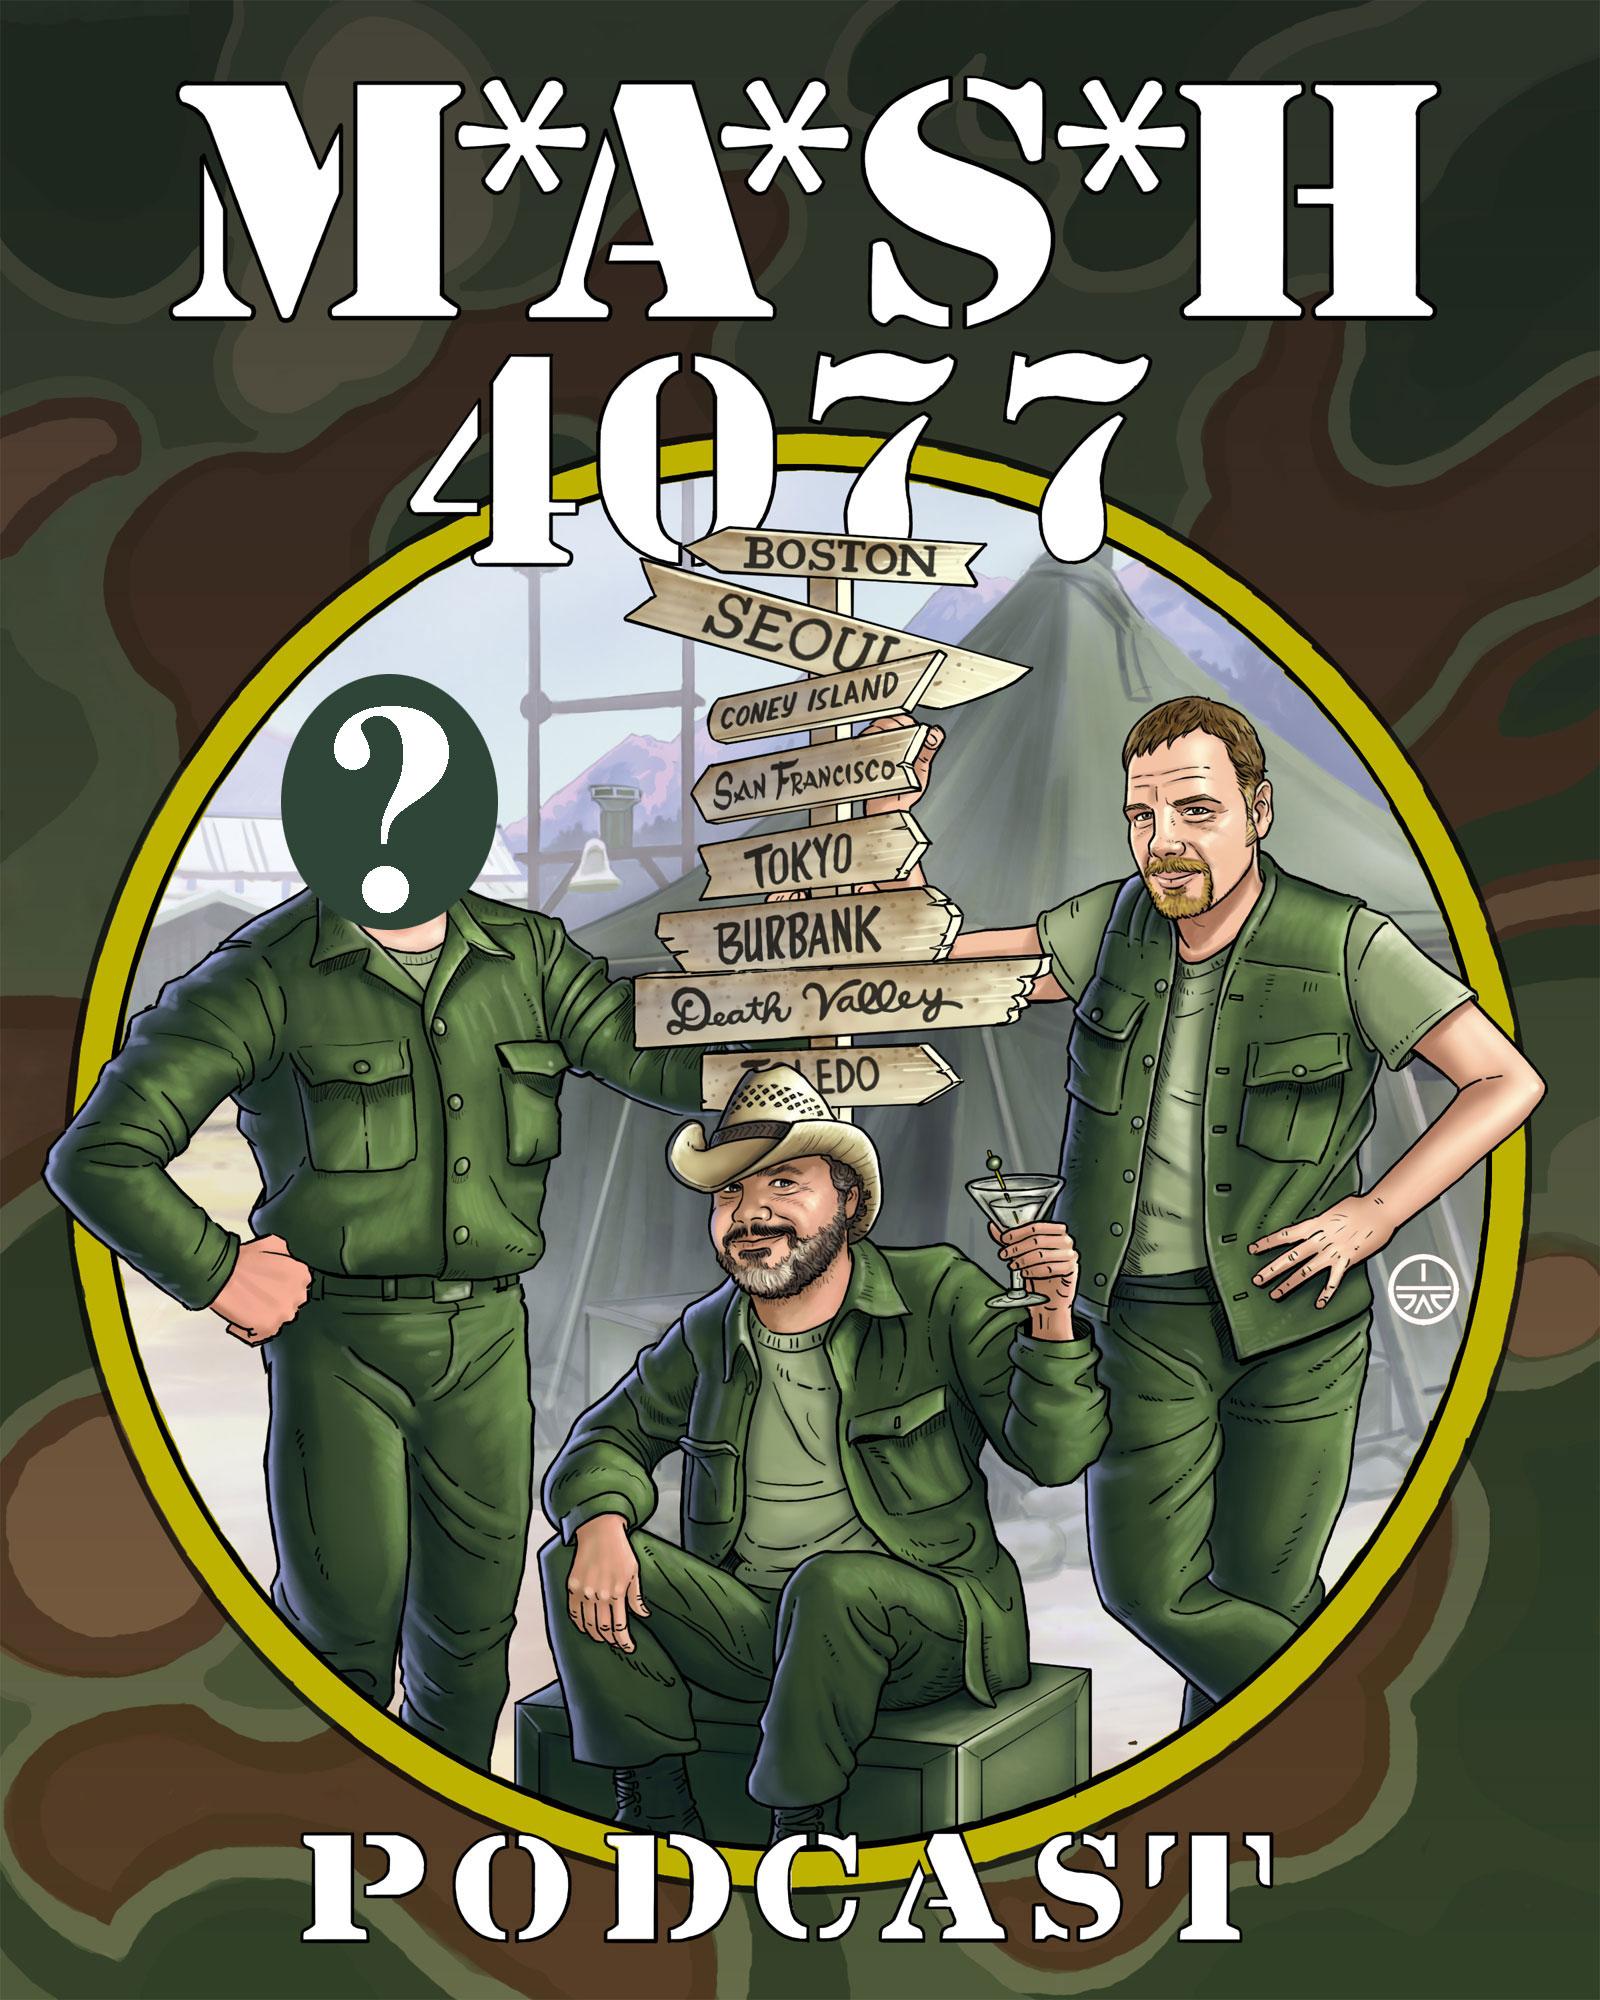 MASH 4077 Podcast